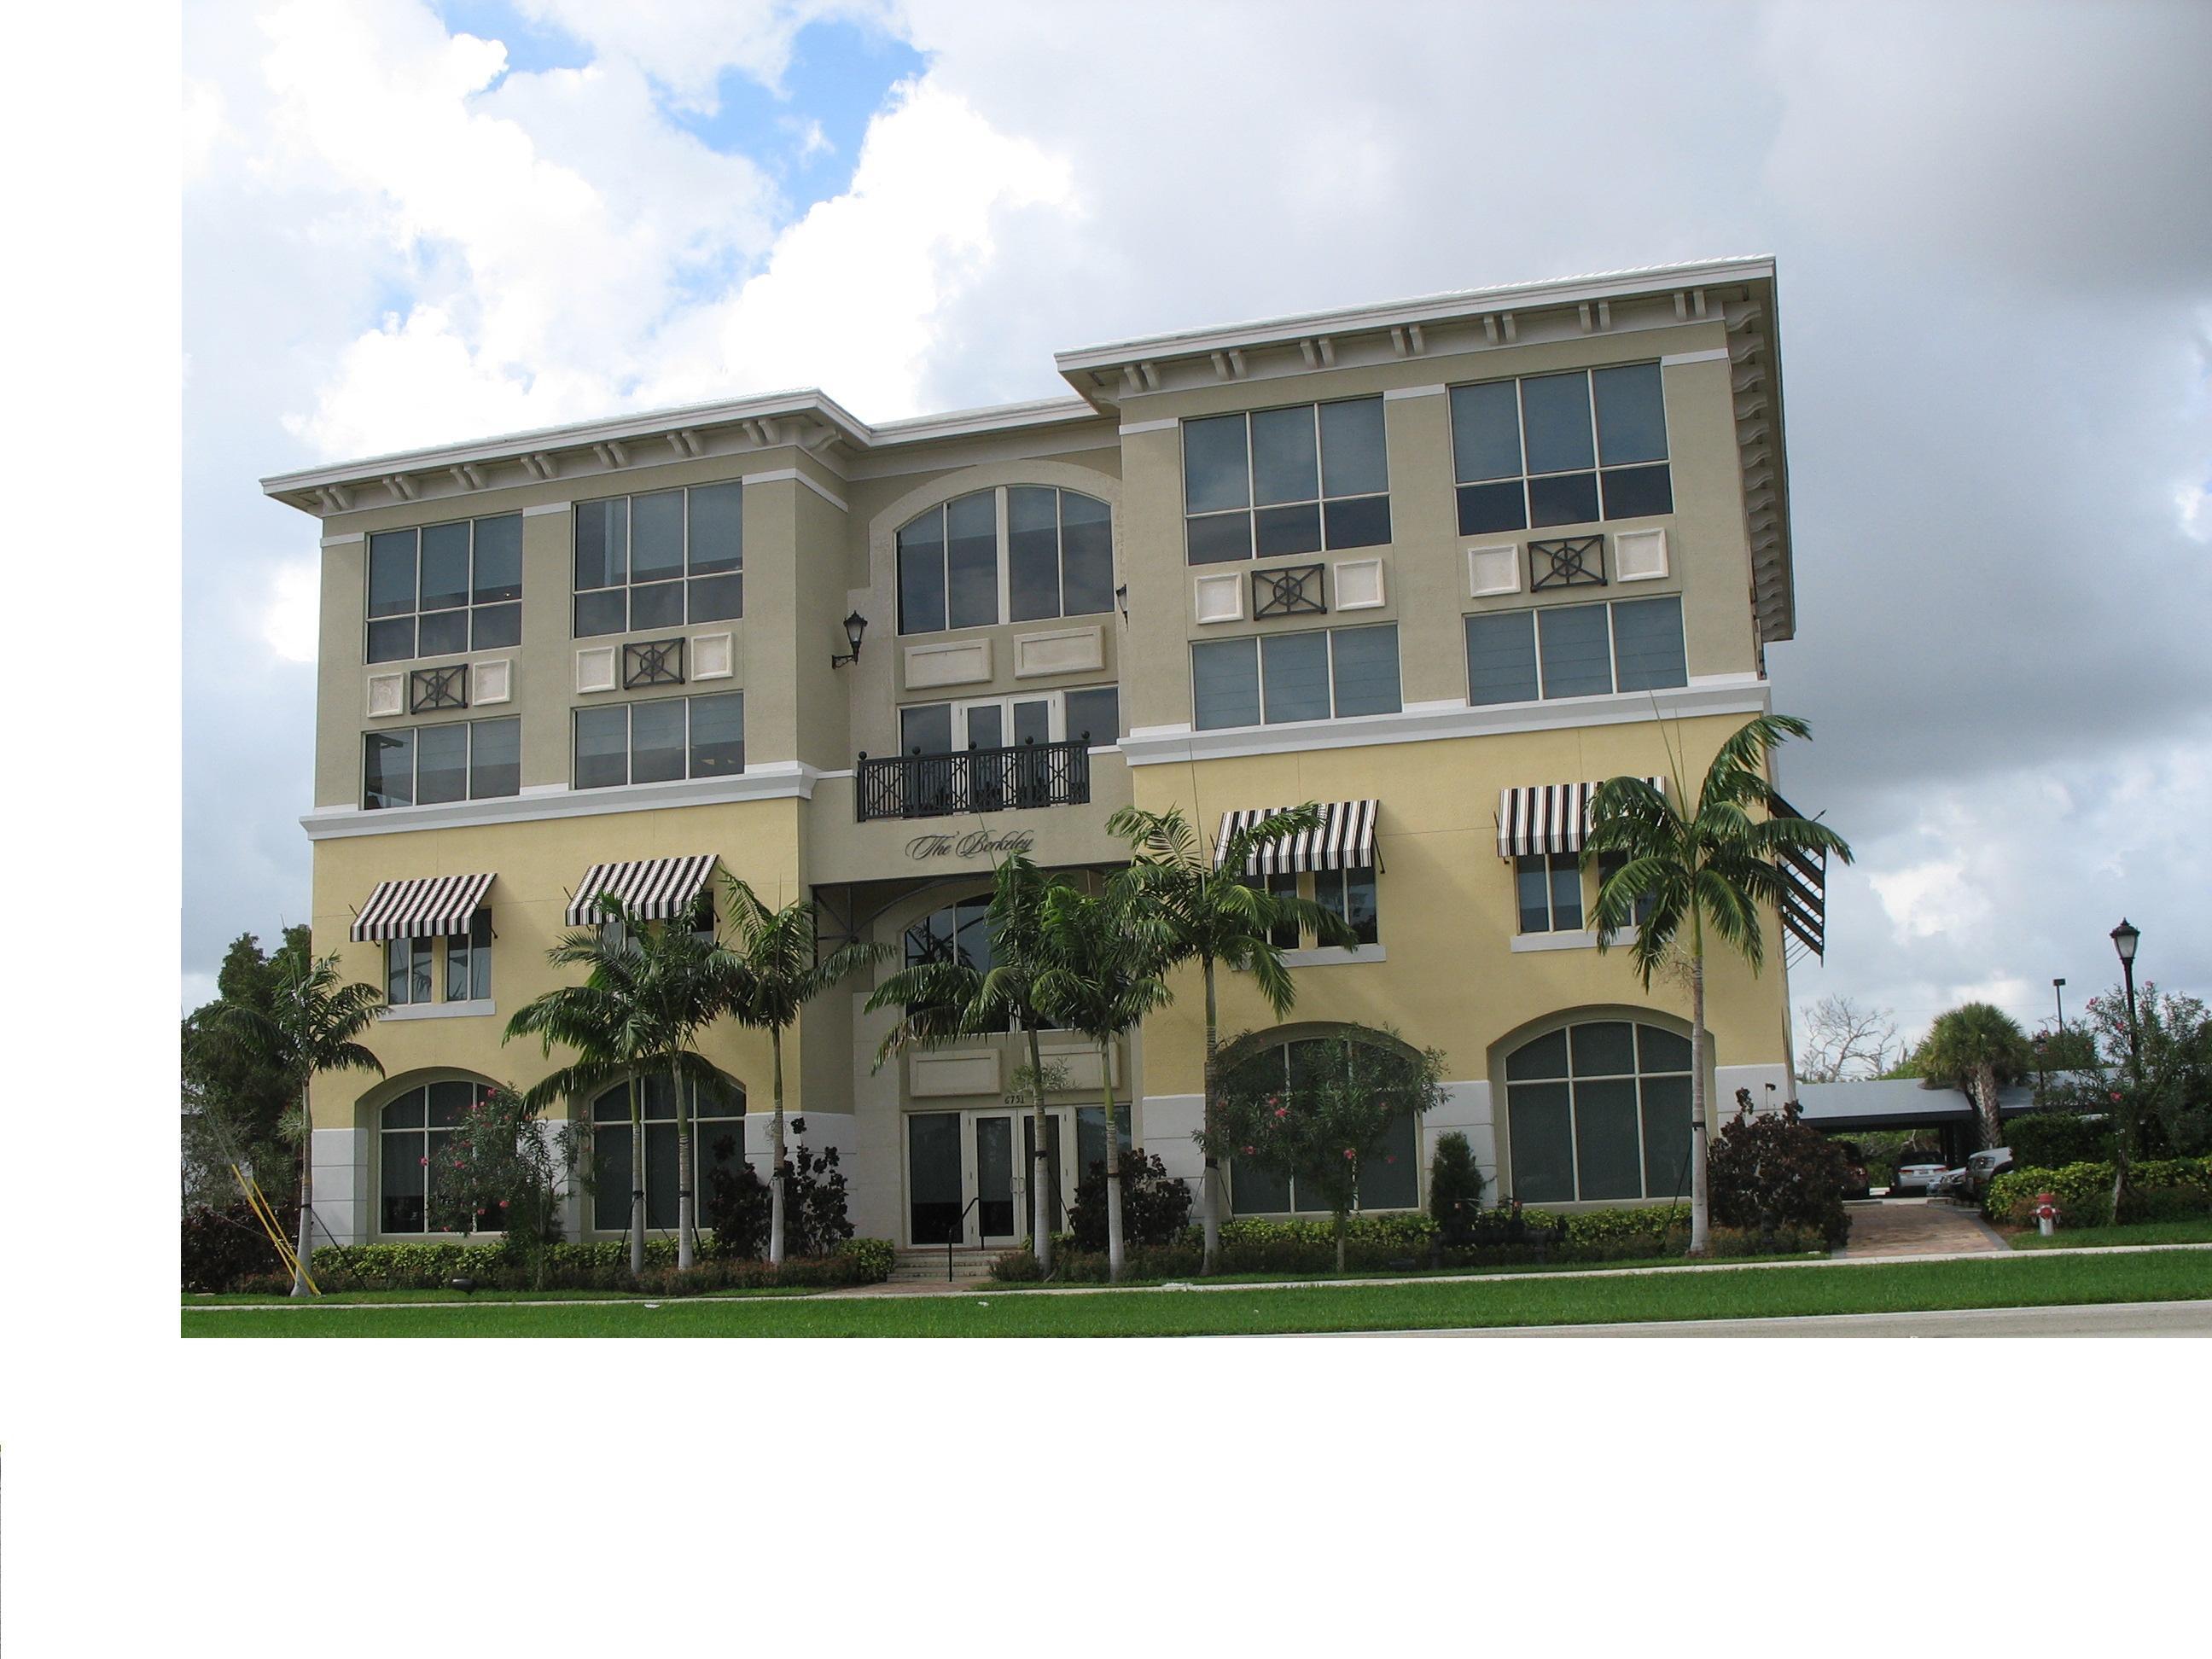 6751 Federal Unit 400, 401, 402, 403, Boca Raton, Florida 33487